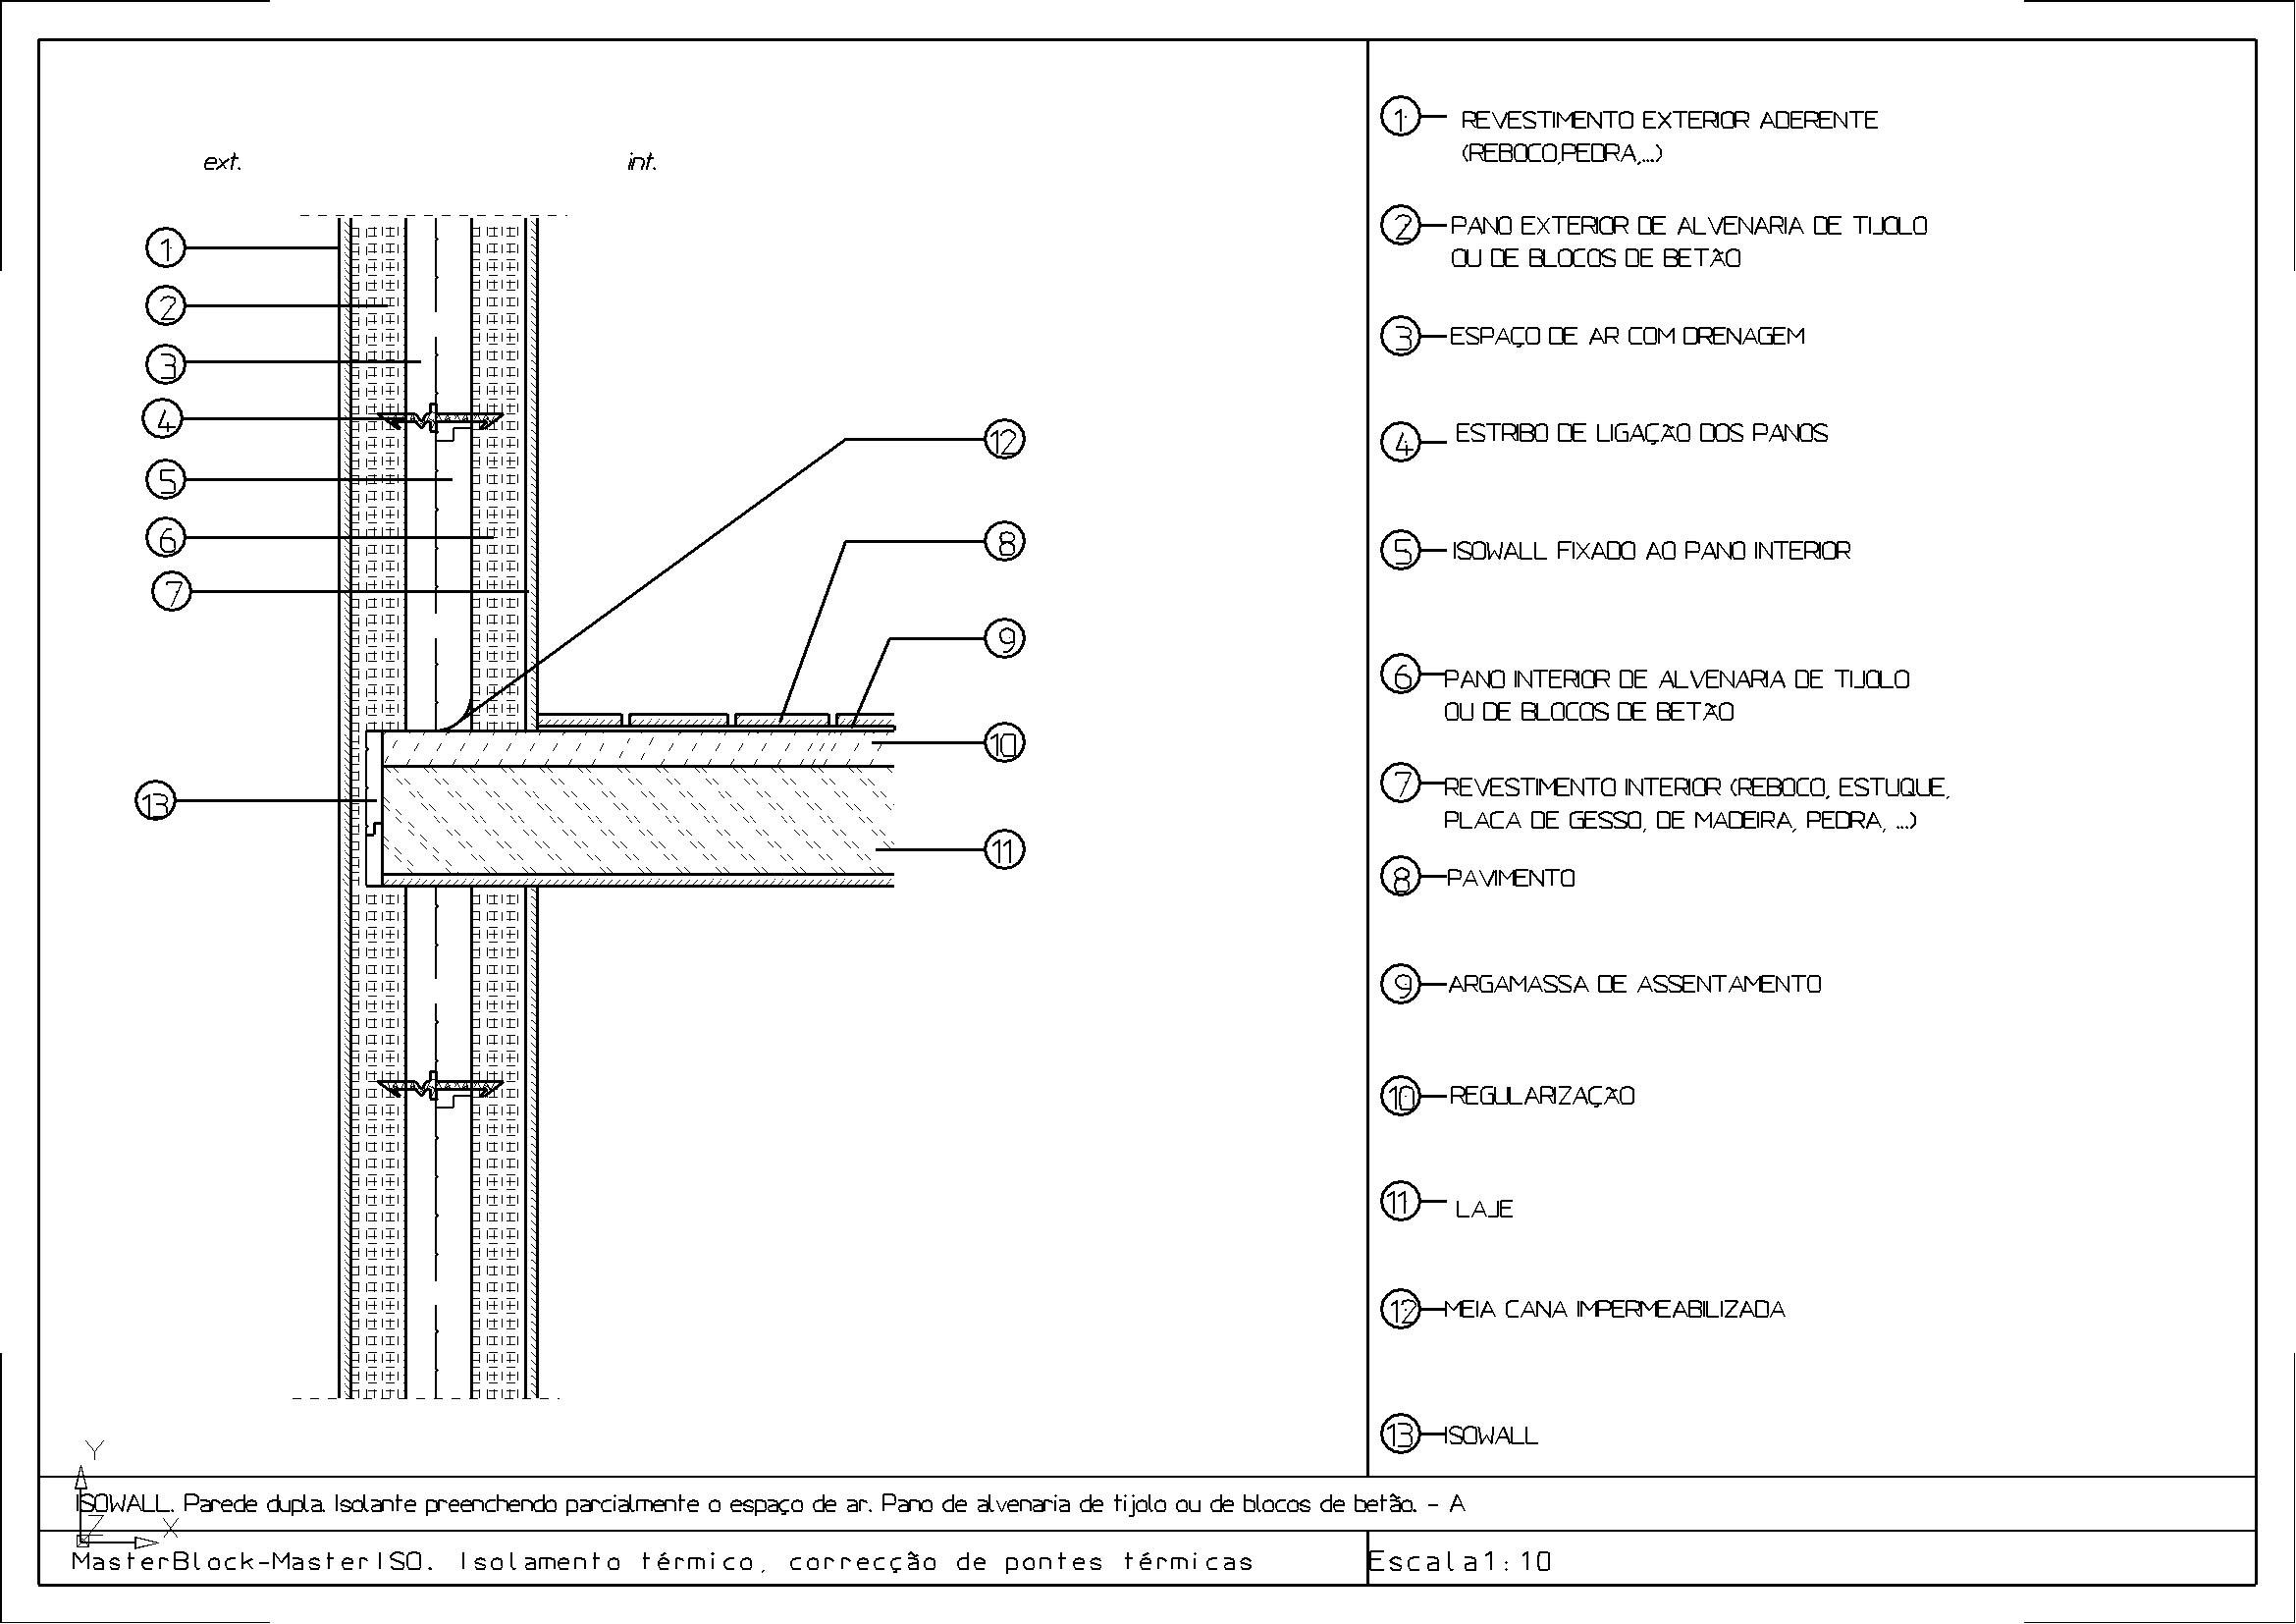 Detalhes CAD de MASTER ISO MASTERBLOCK #454545 2339 1654